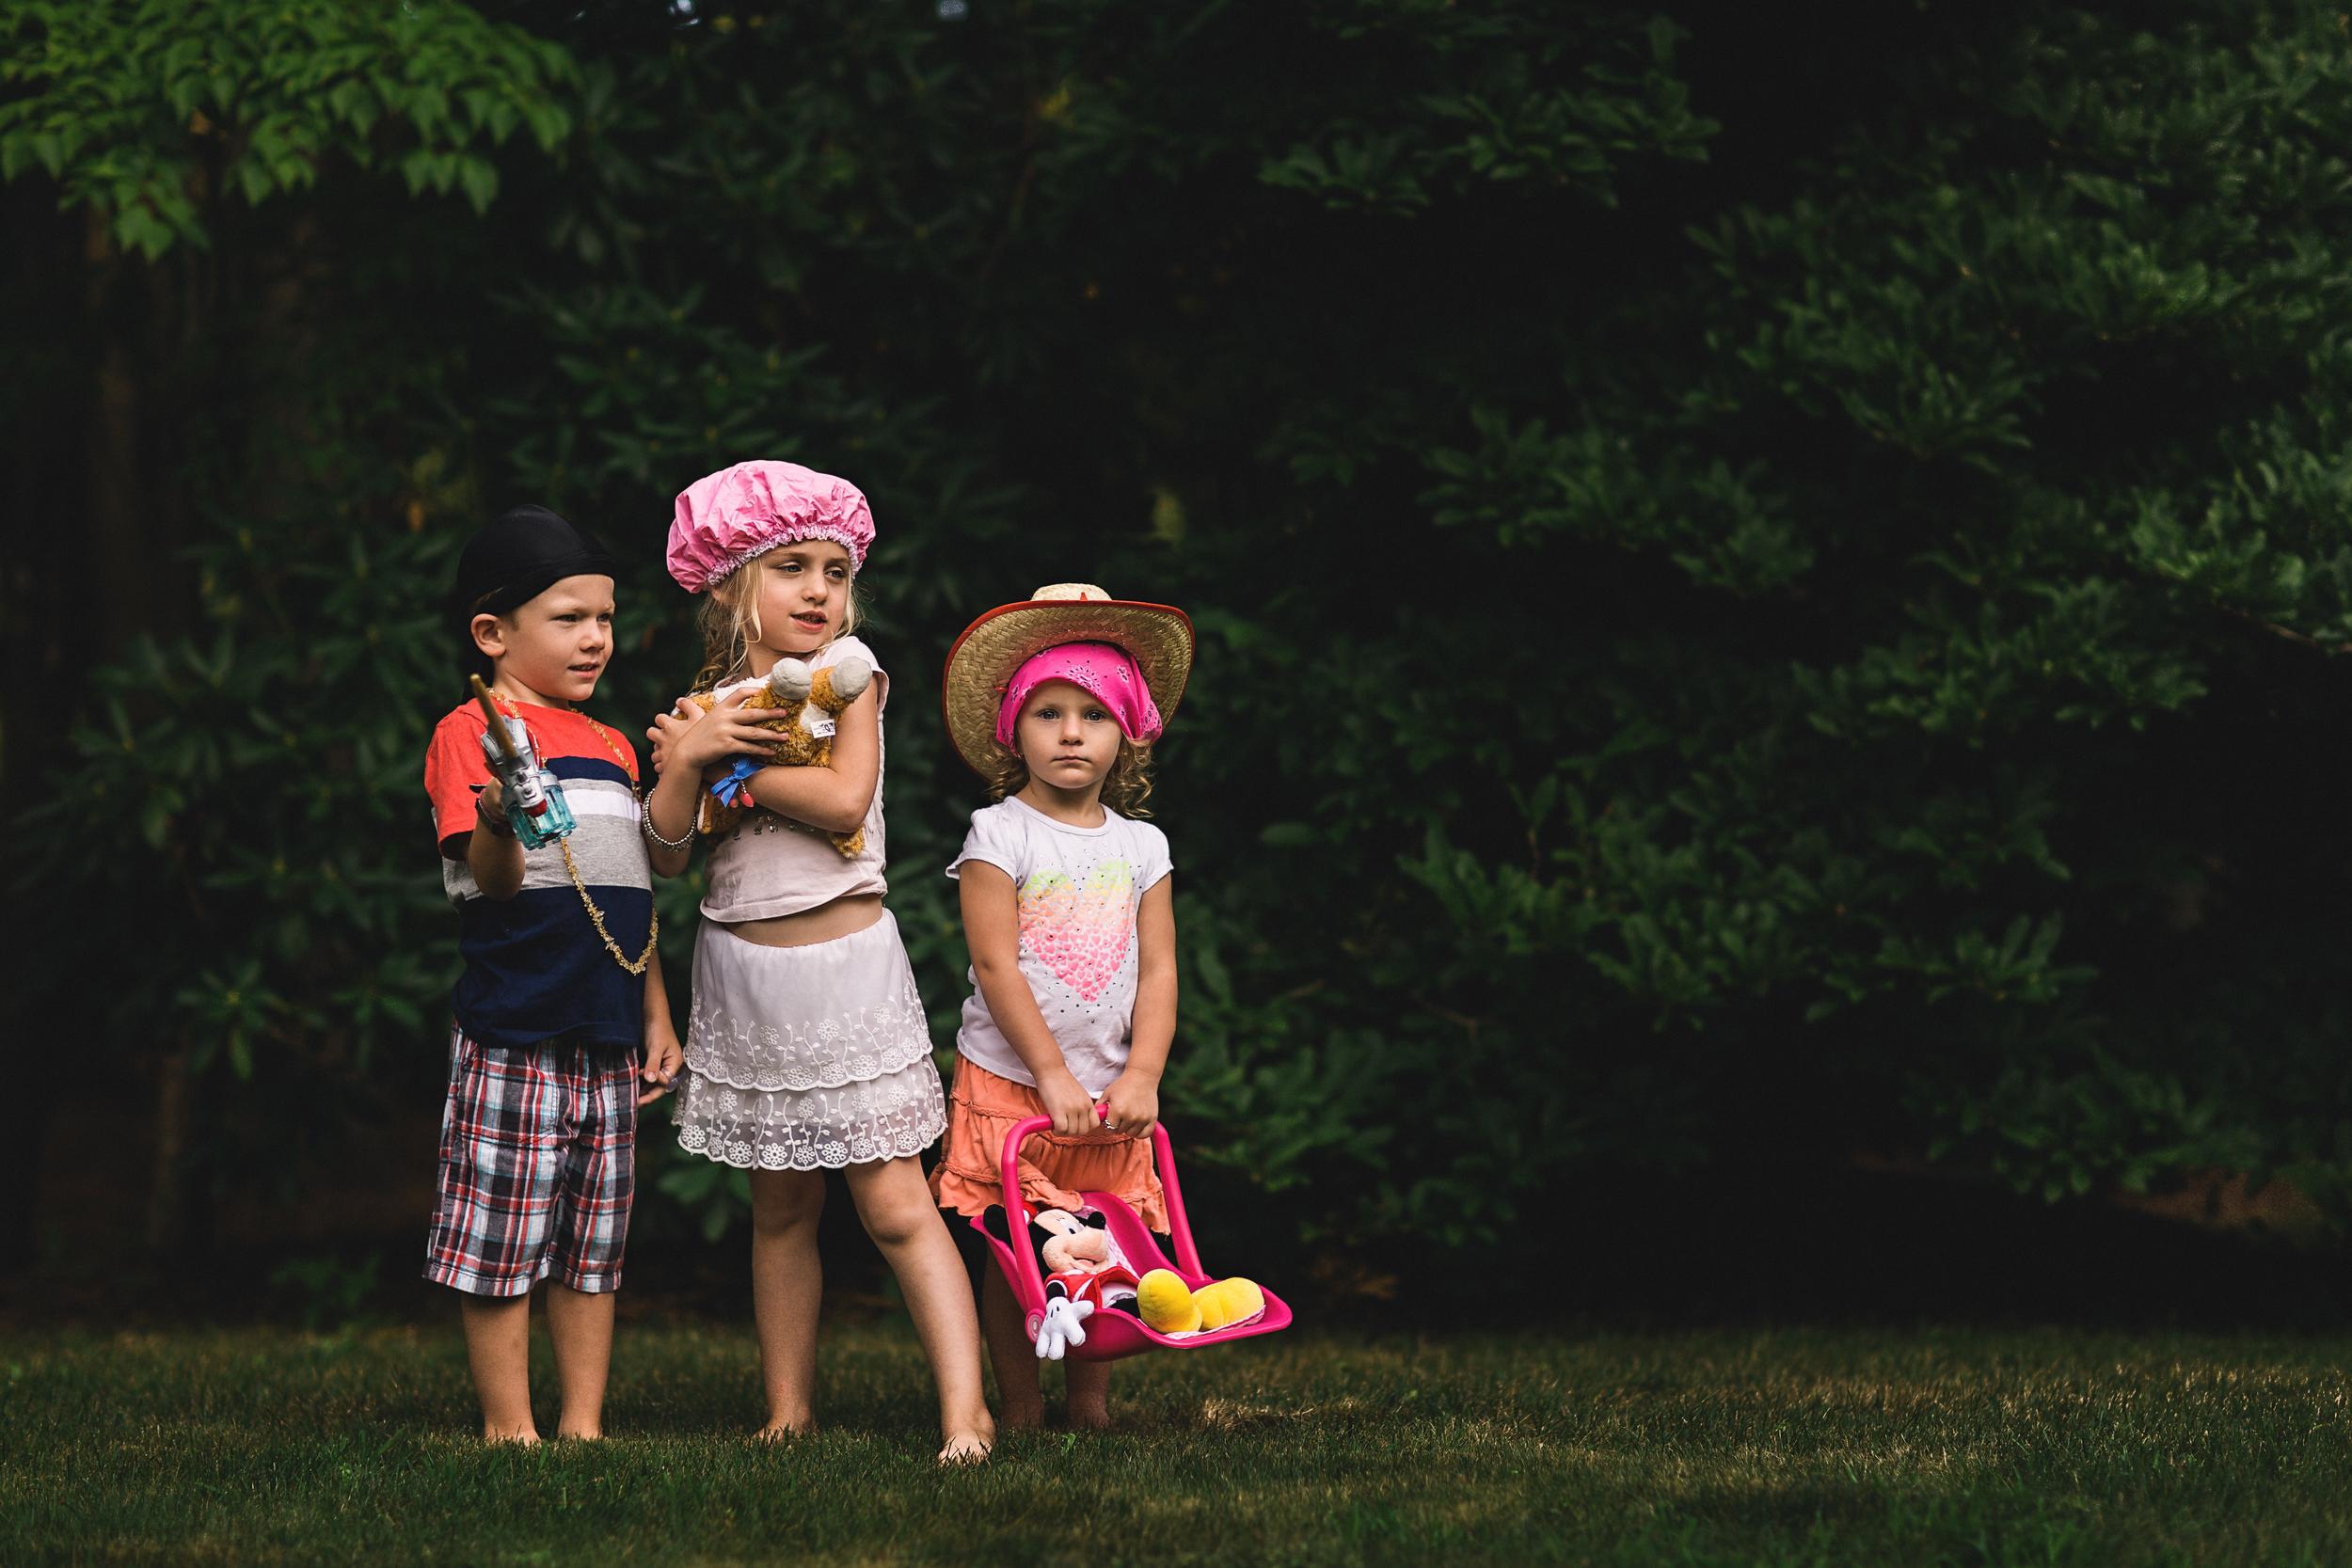 long-island-photographyer-hello-olivia-photography-kids-silly.jpg